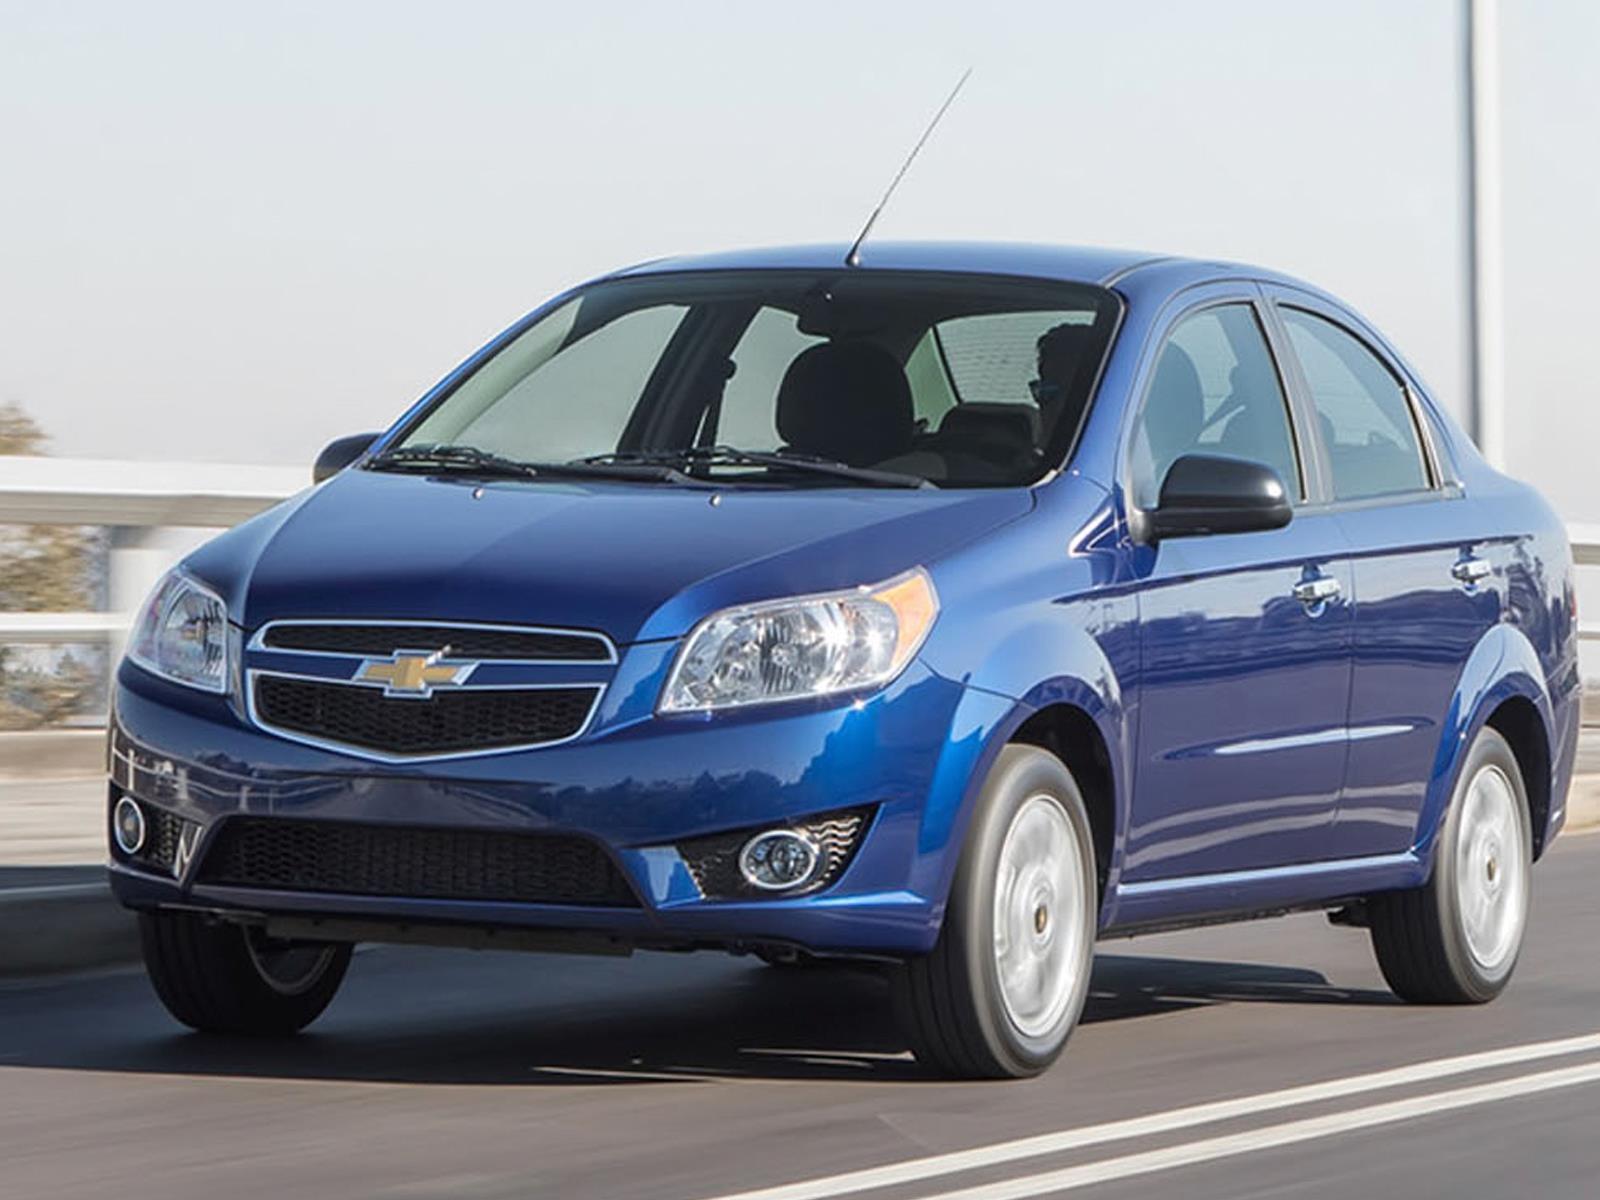 Chevrolet Sonic 2018 >> Chevrolet Aveo 2018 llega a México desde $198,600 pesos - Autocosmos.com